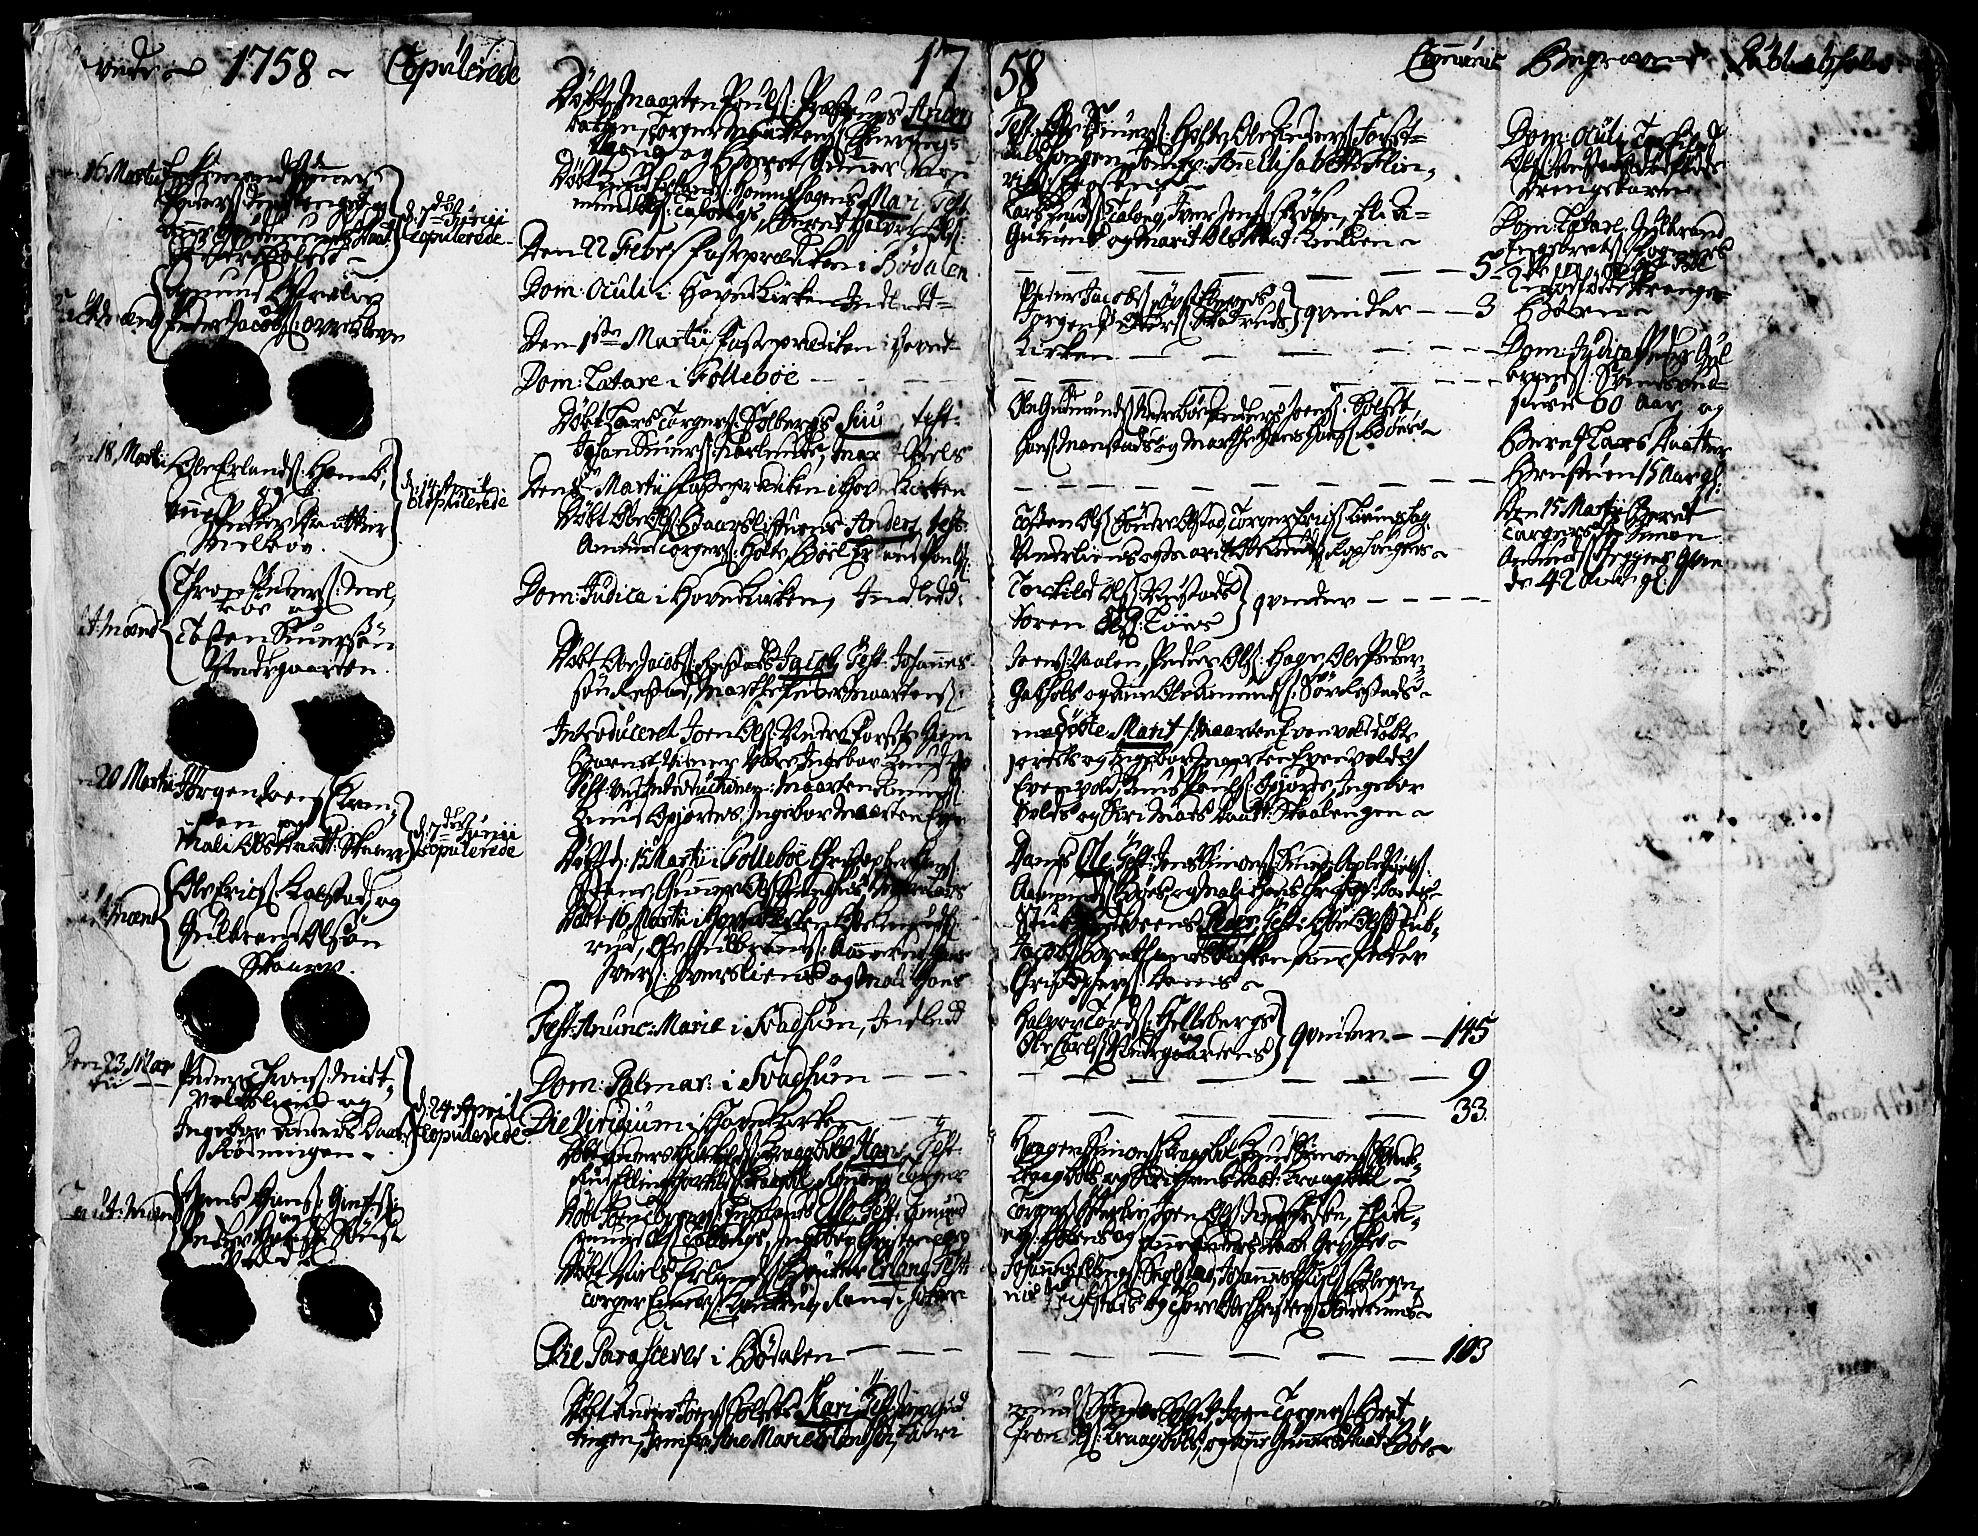 SAH, Gausdal prestekontor, Ministerialbok nr. 3, 1758-1809, s. 3